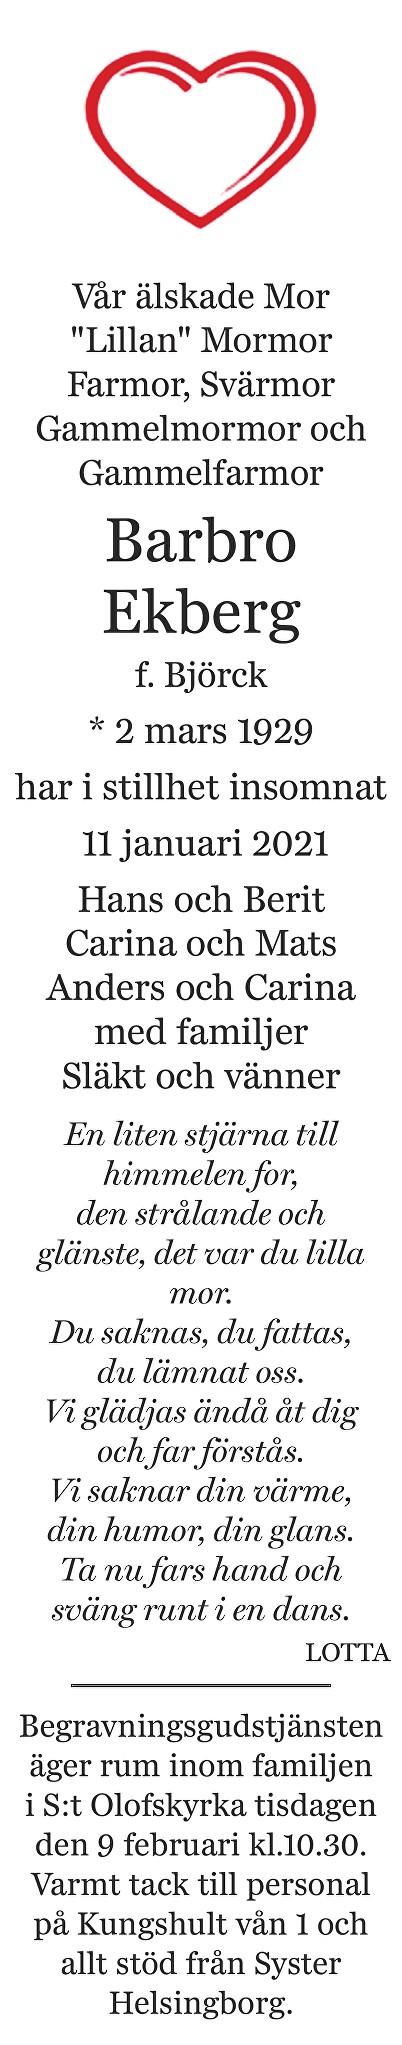 Barbro Ekberg Death notice